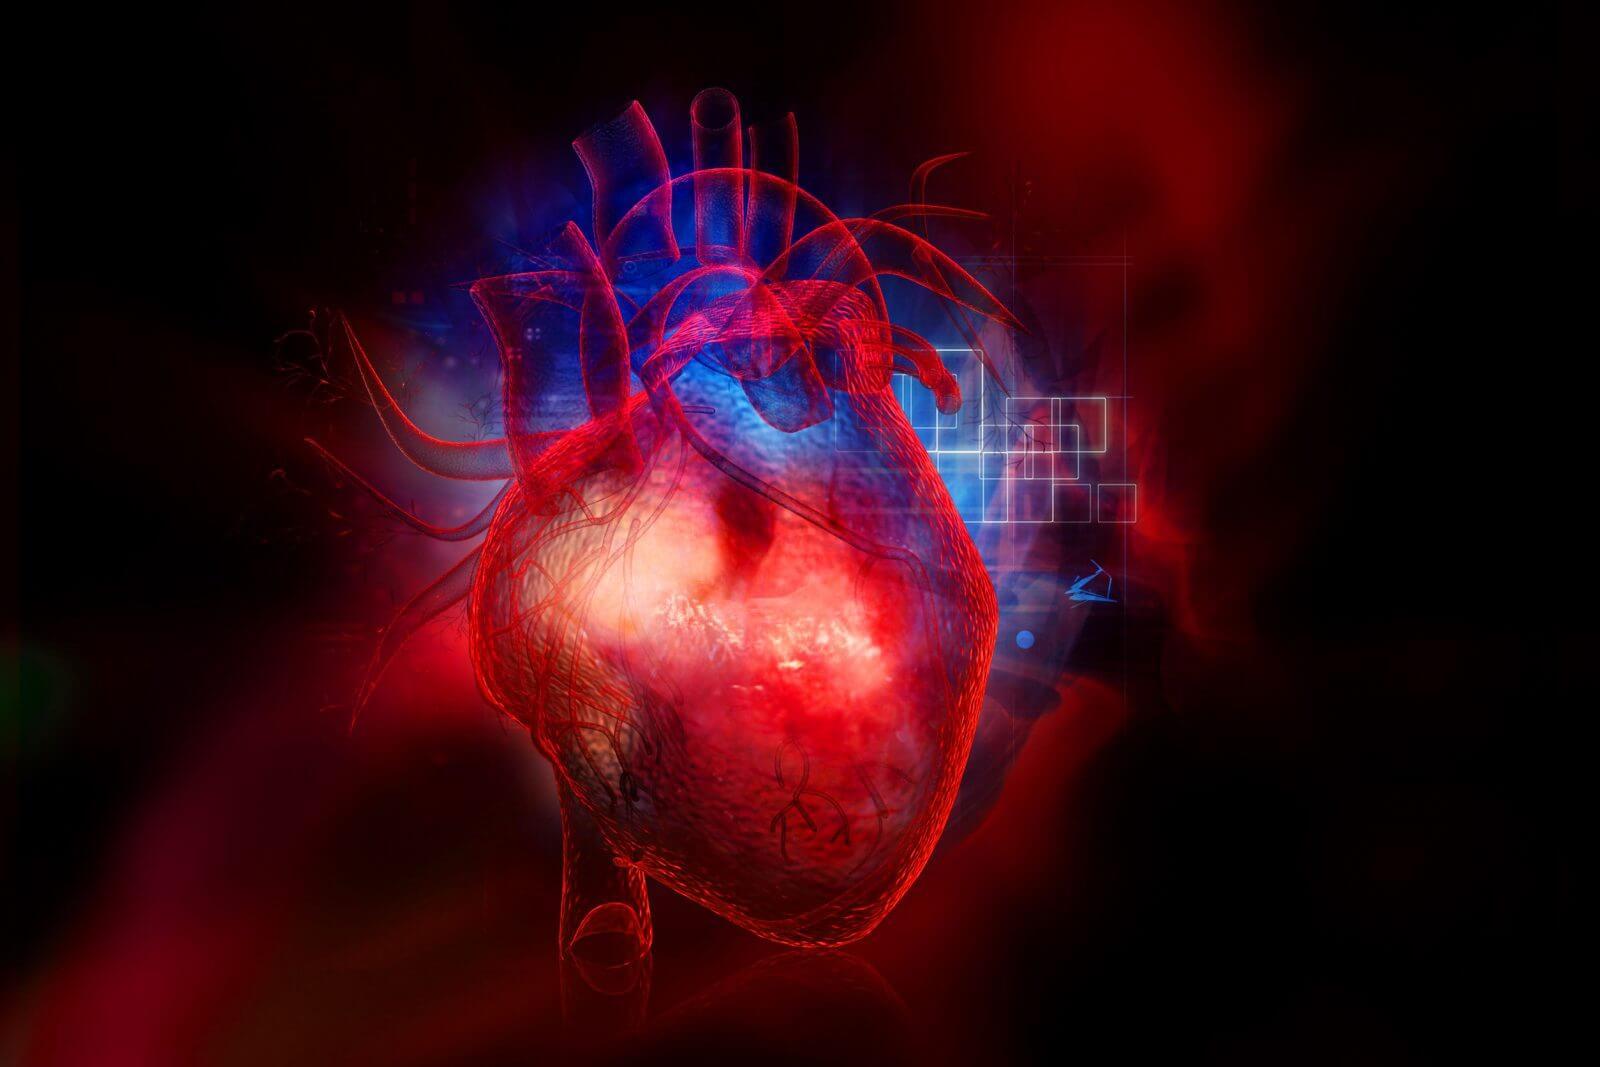 curar un corazón roto